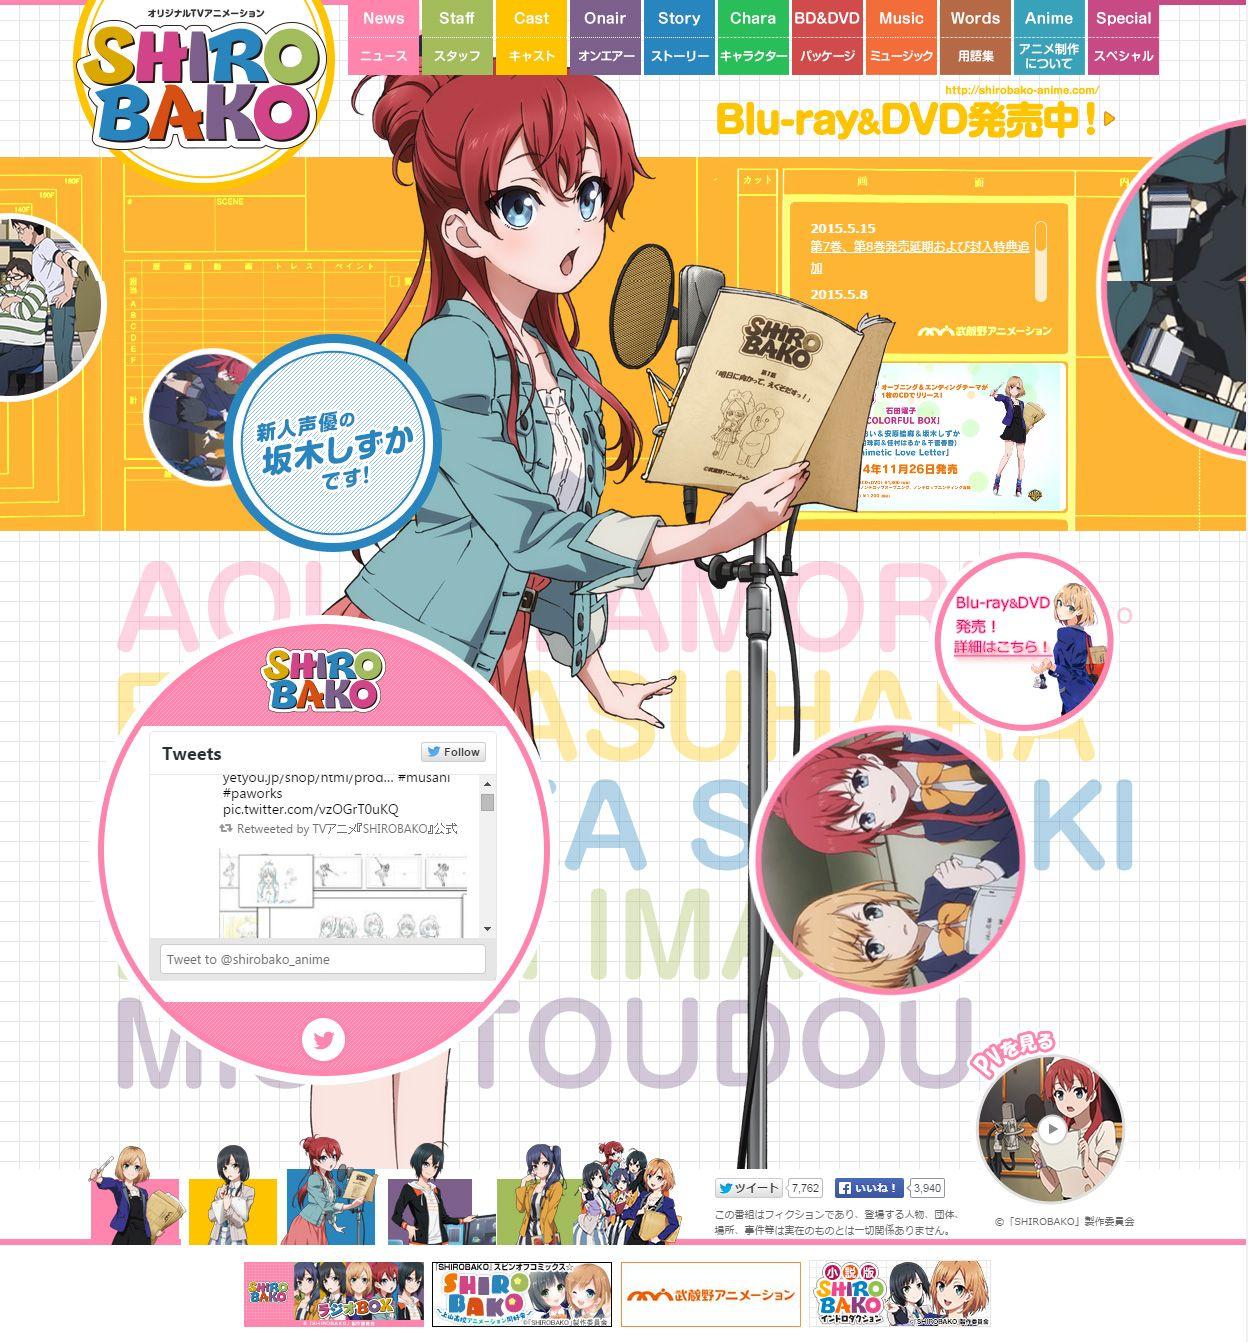 tvアニメ shirobako 公式サイト lp デザイン ウェブデザインのレイアウト ウェブデザイン